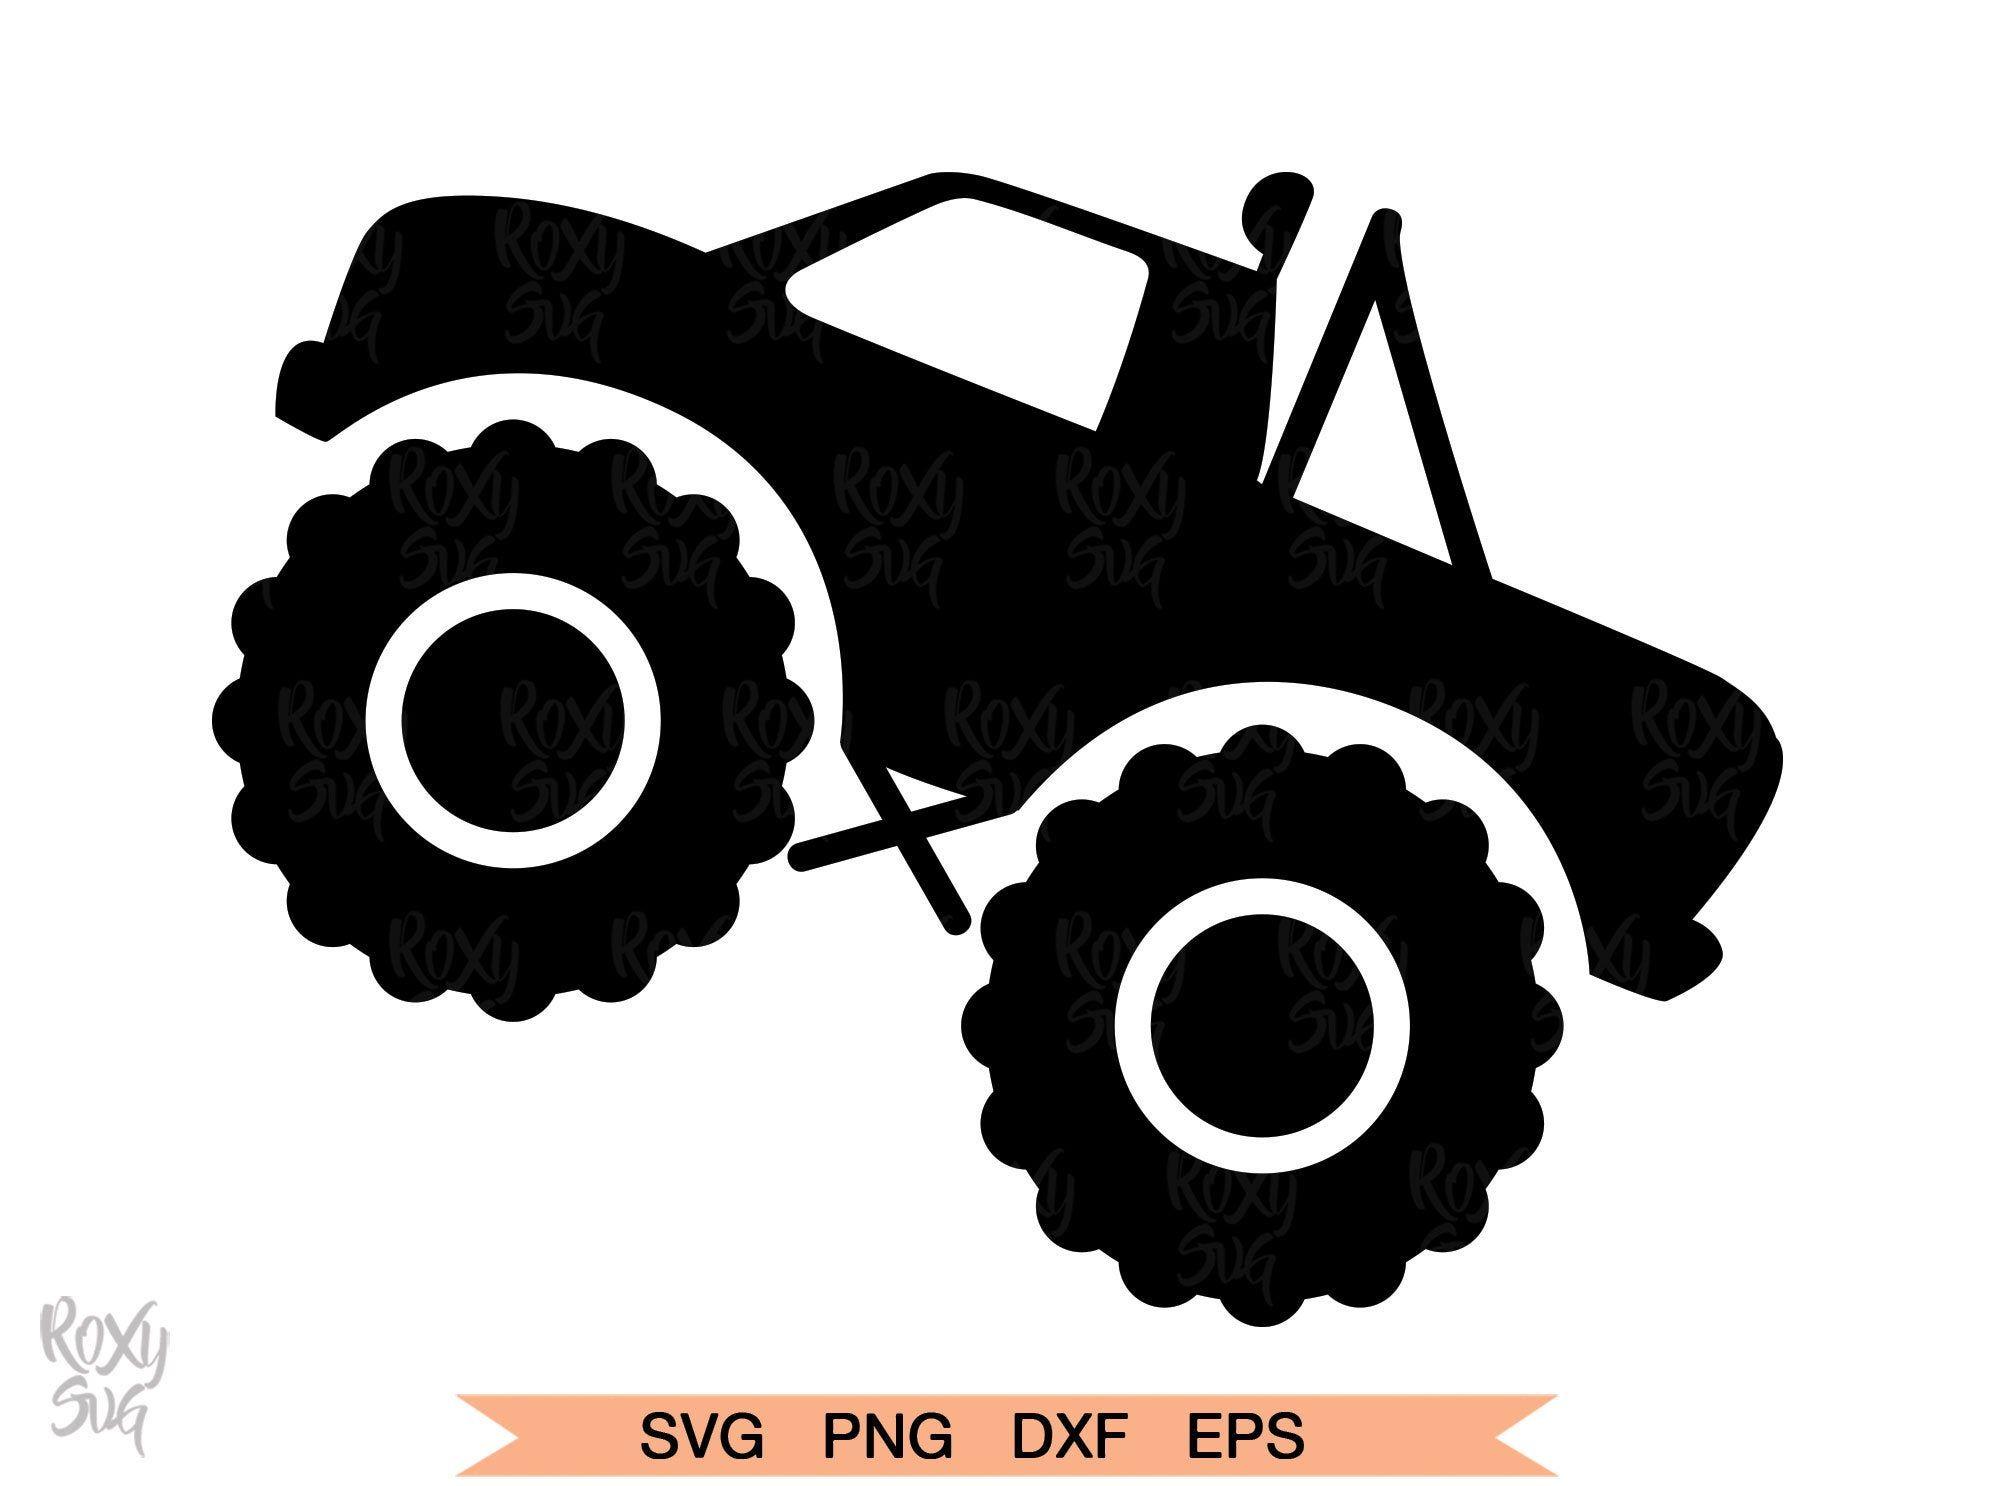 Truck Svg Monster Truck Svg Truck Clipart Monster Truck Svg Etsy Monster Trucks Trucks Cricut Projects Vinyl